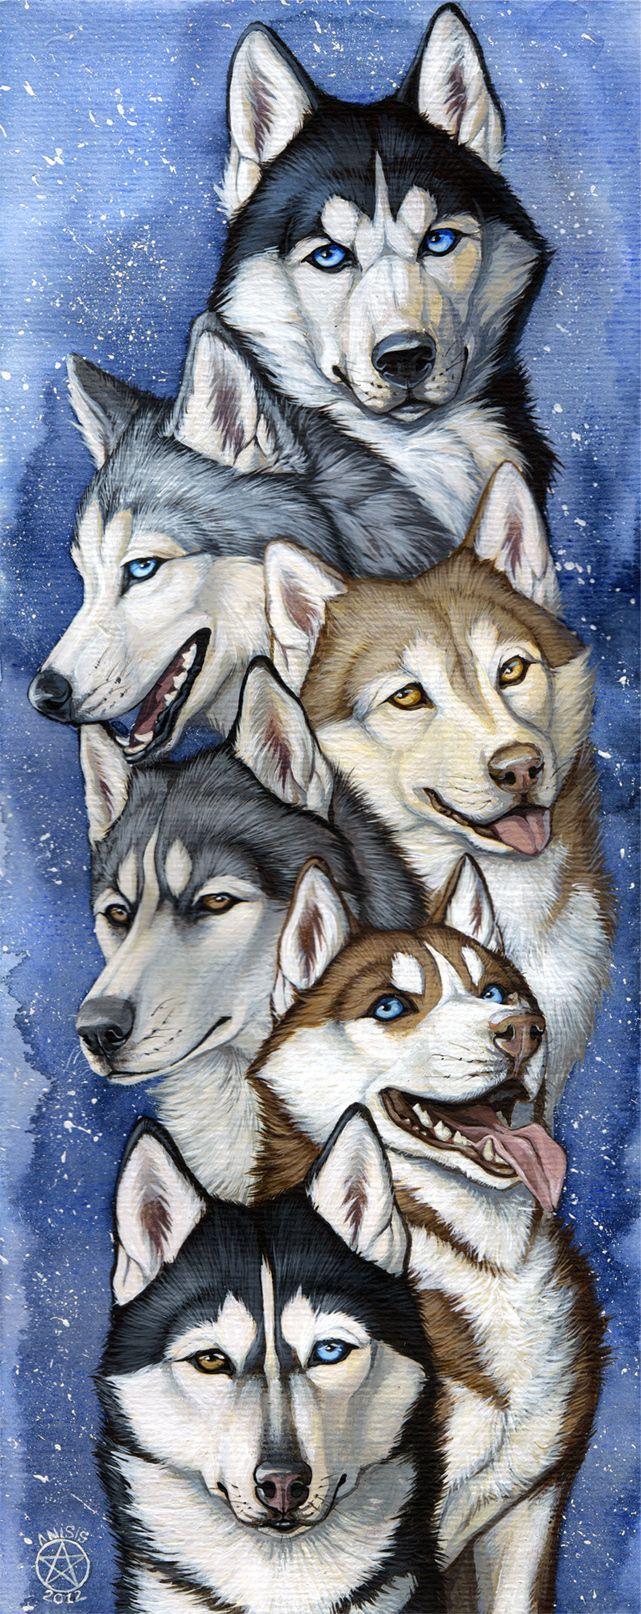 Drawn husky demon dog SIBERIAN dogs best Anisis HUSKIES